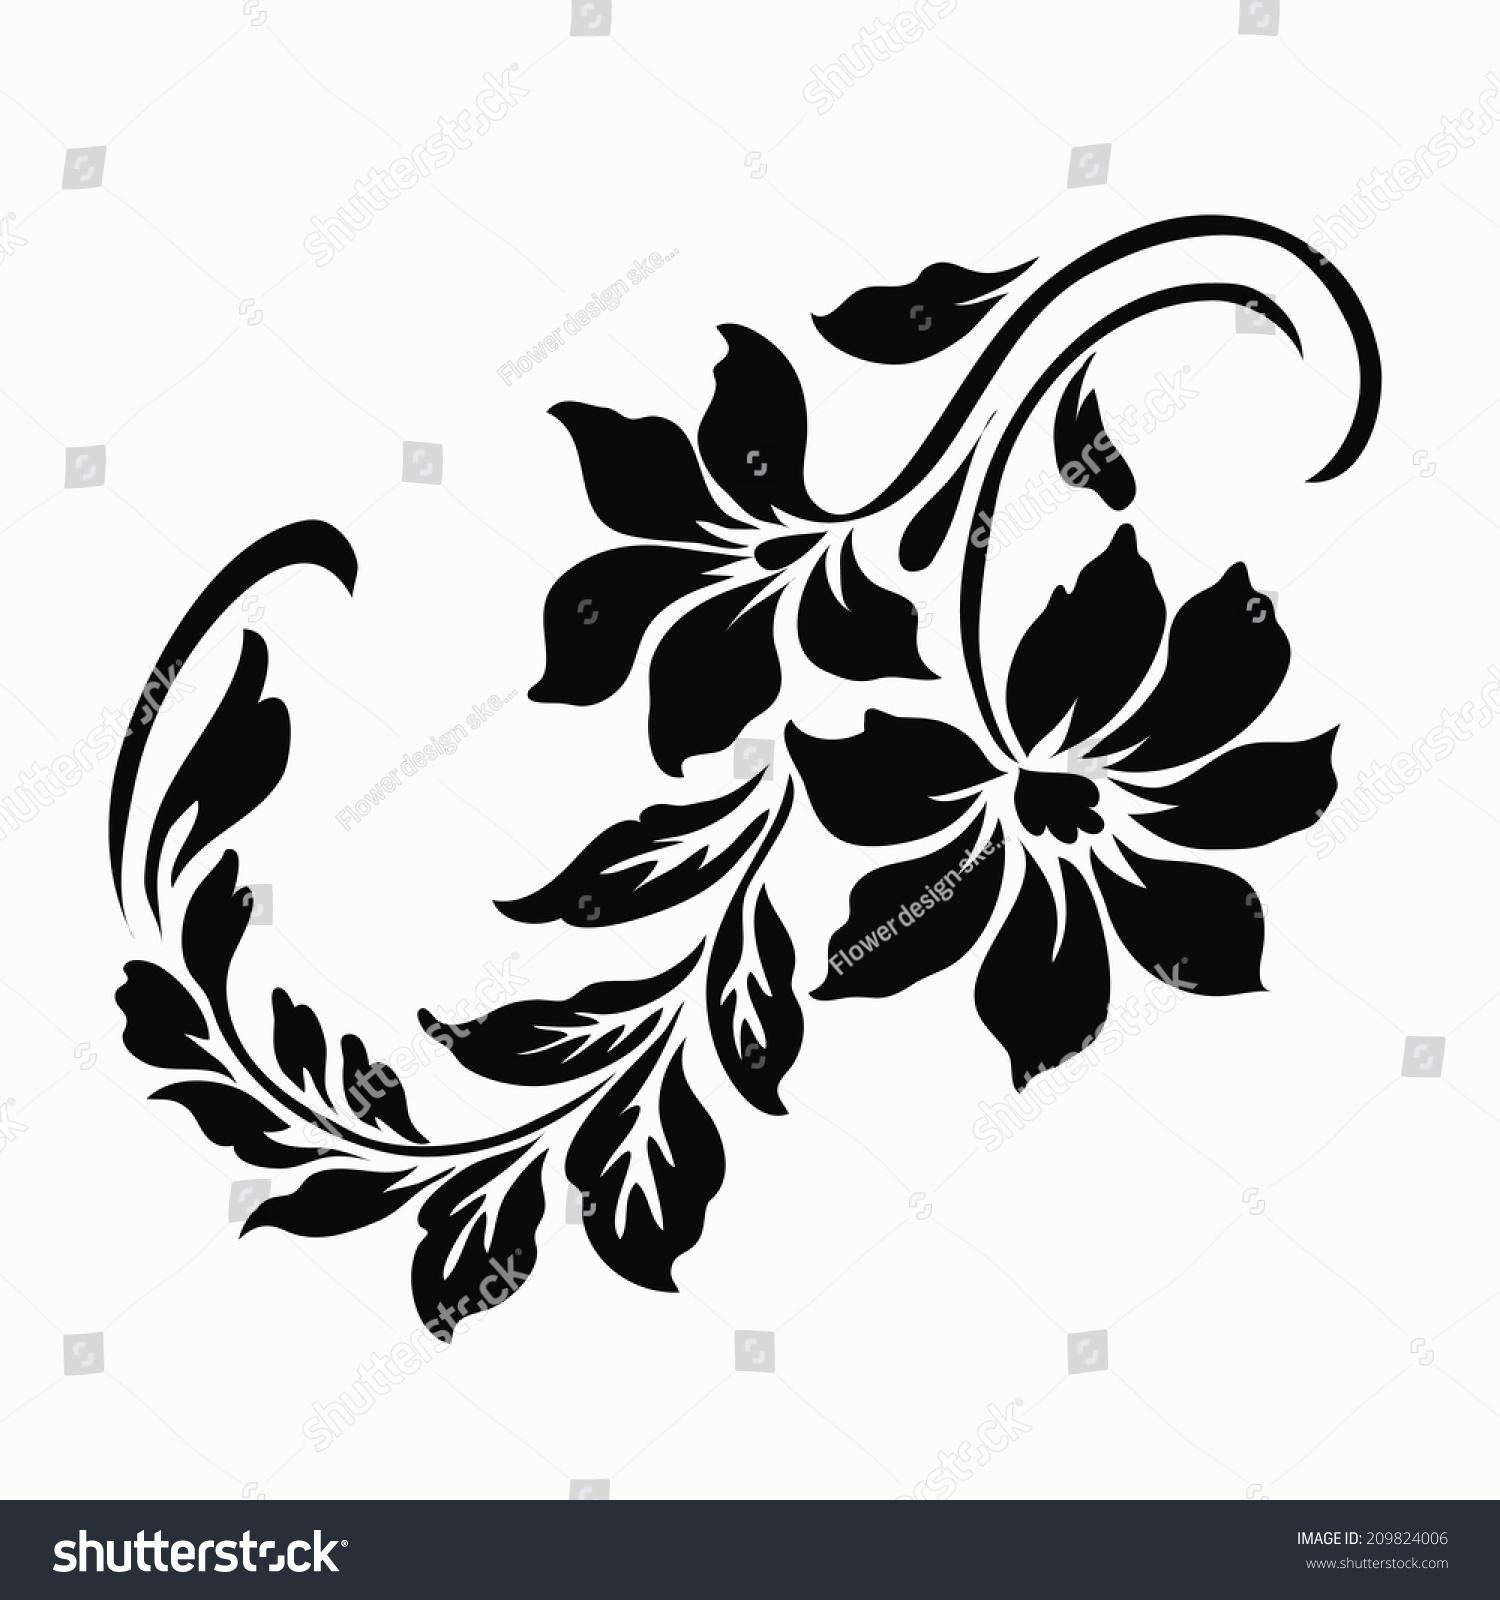 Flower Motif Design Stock Vector Royalty Free 209824006 Shutterstock